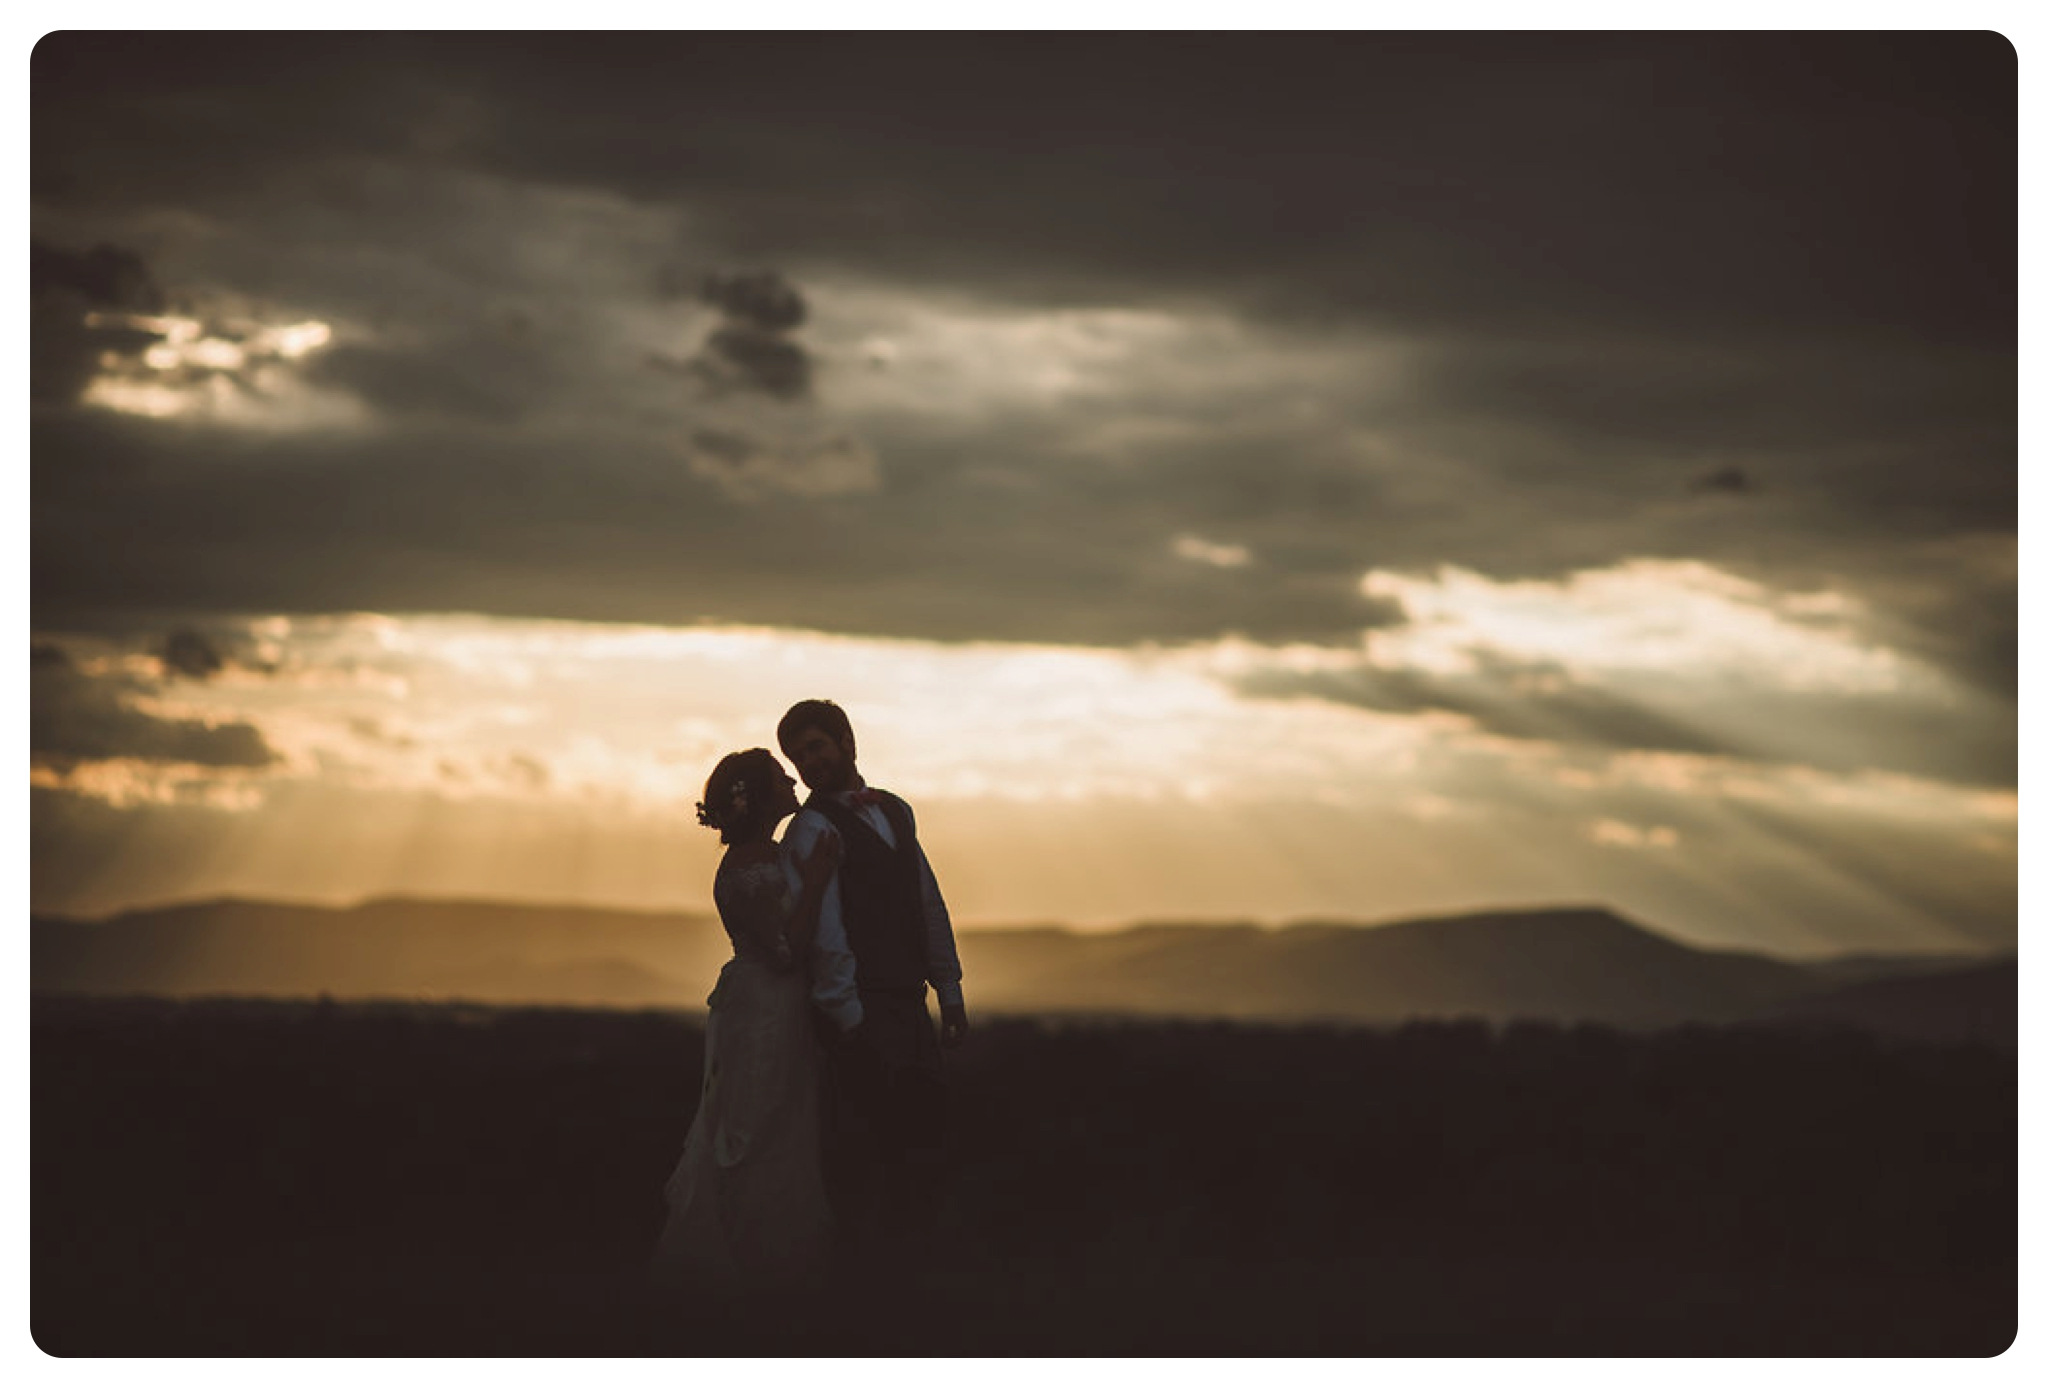 Braeloch-Weddings-Wedding-Photographer-Pat-Cori-Photography-034.jpg